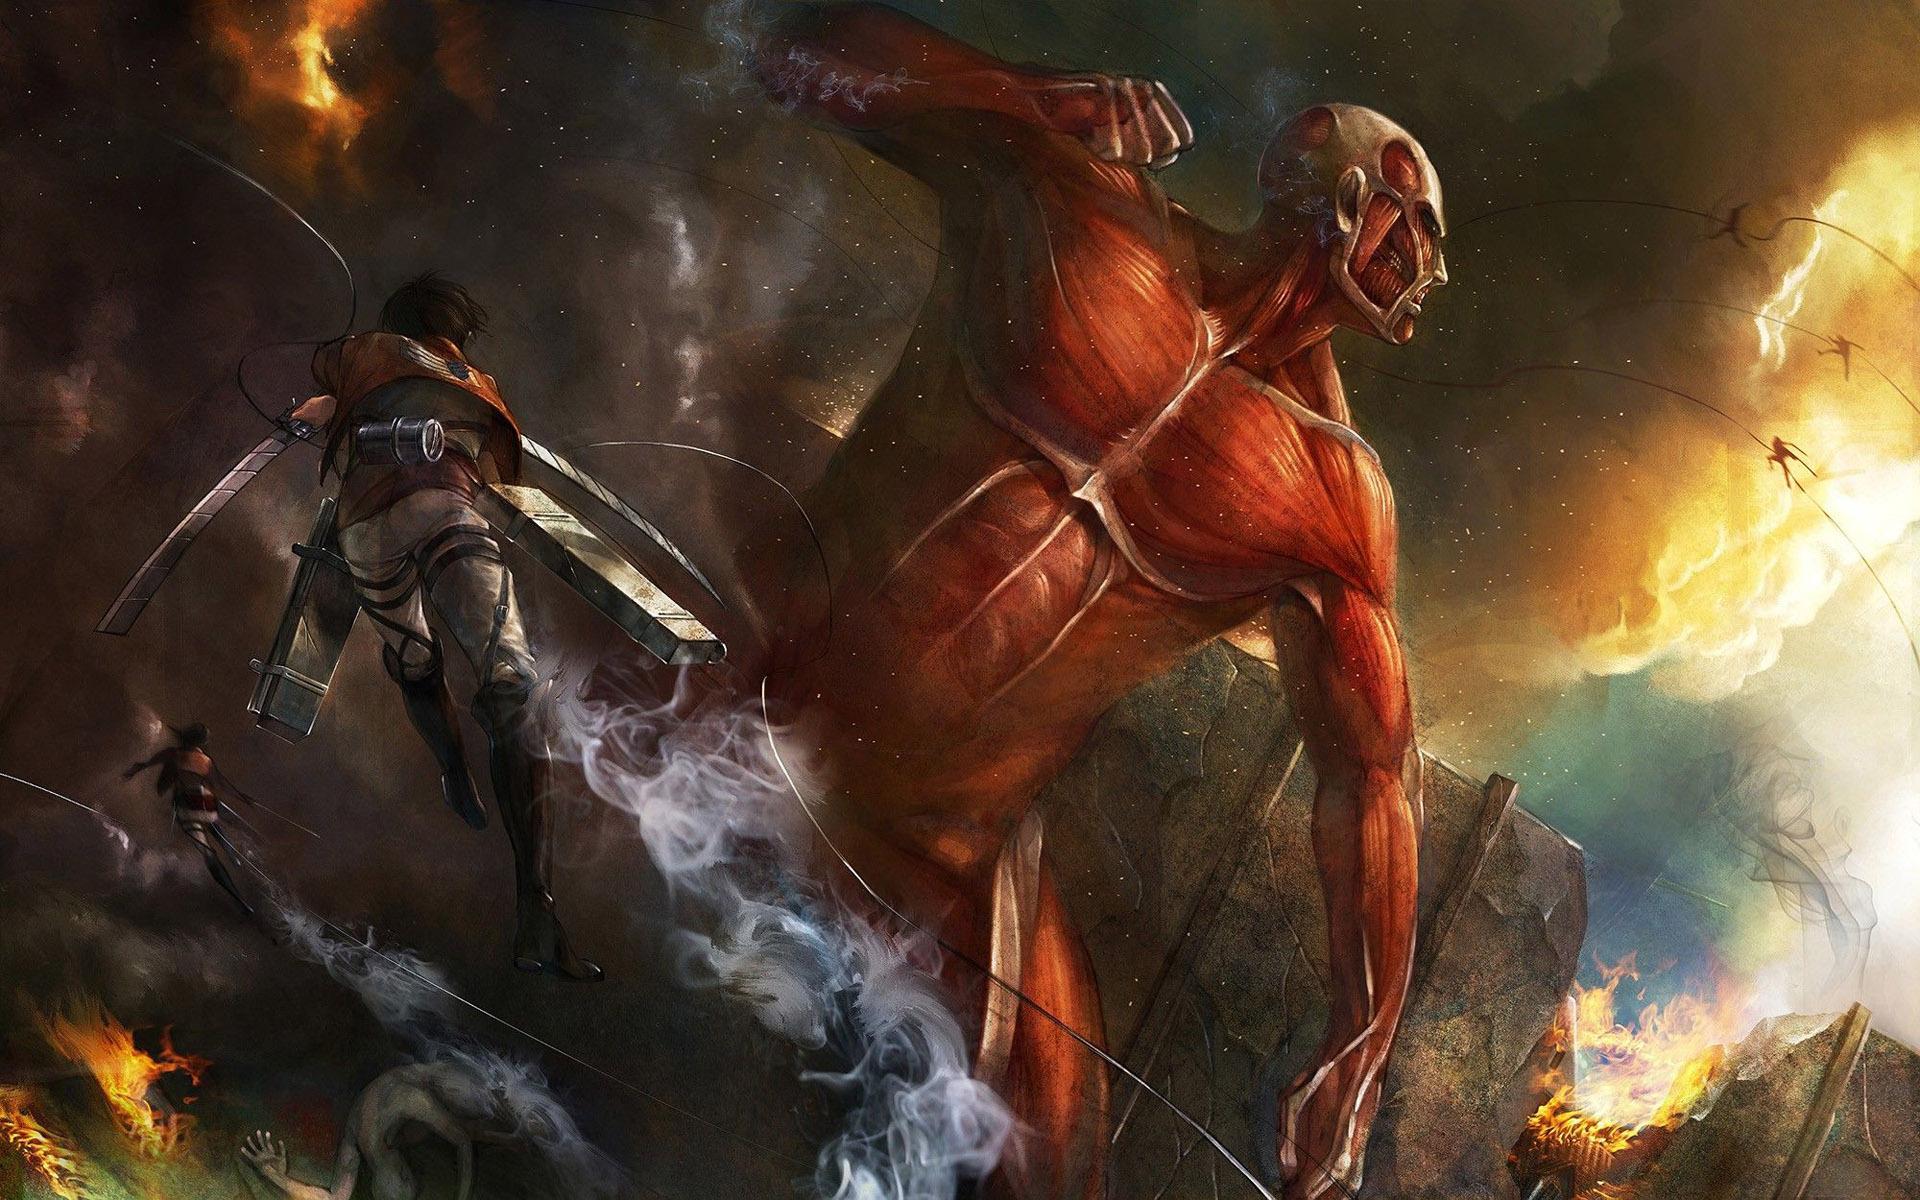 Attack On Titan Anime Hd Wallpaper 1920x1200 2341